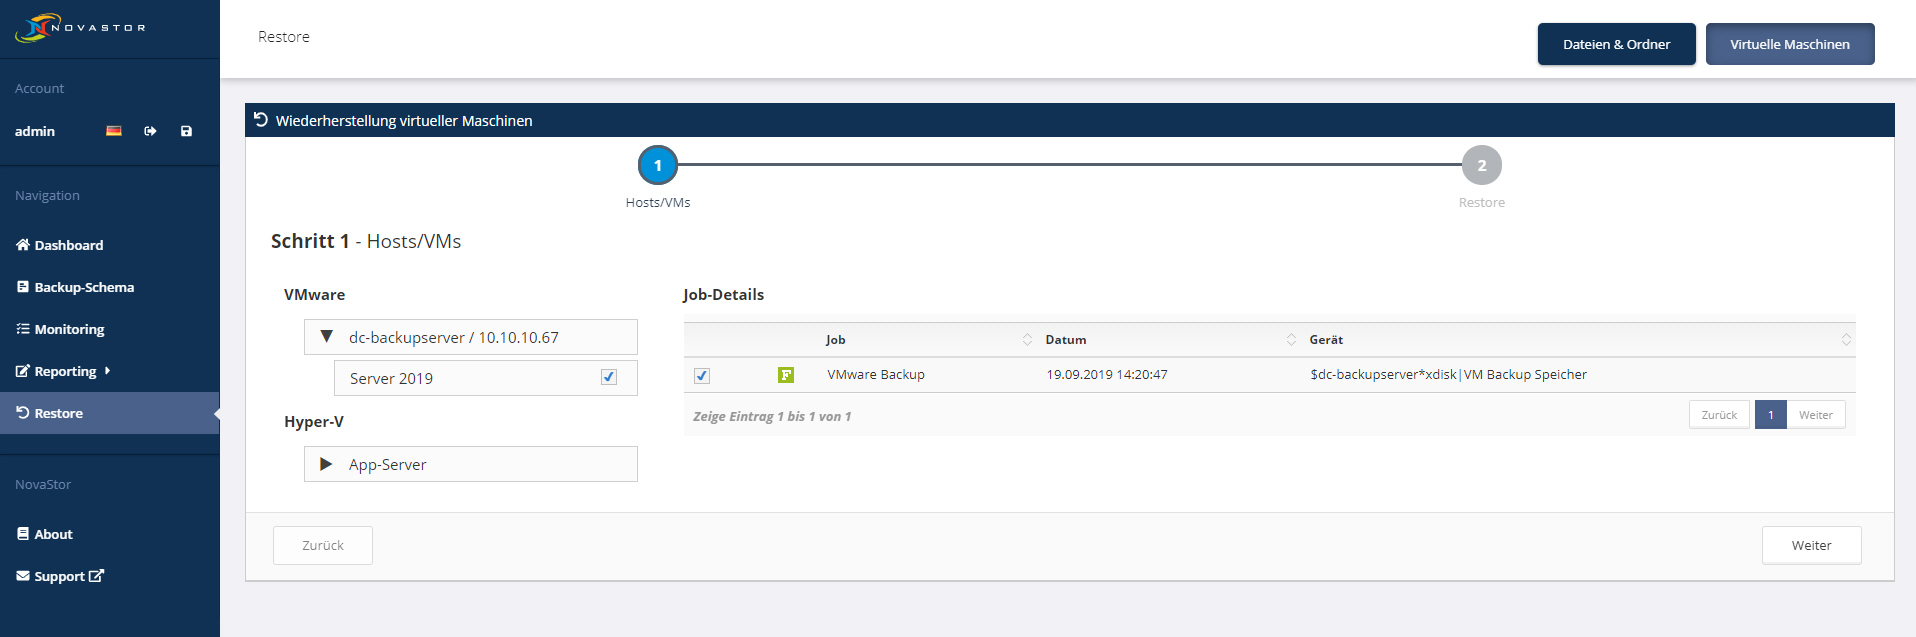 NovaStor DataCenter - VM Restore #1